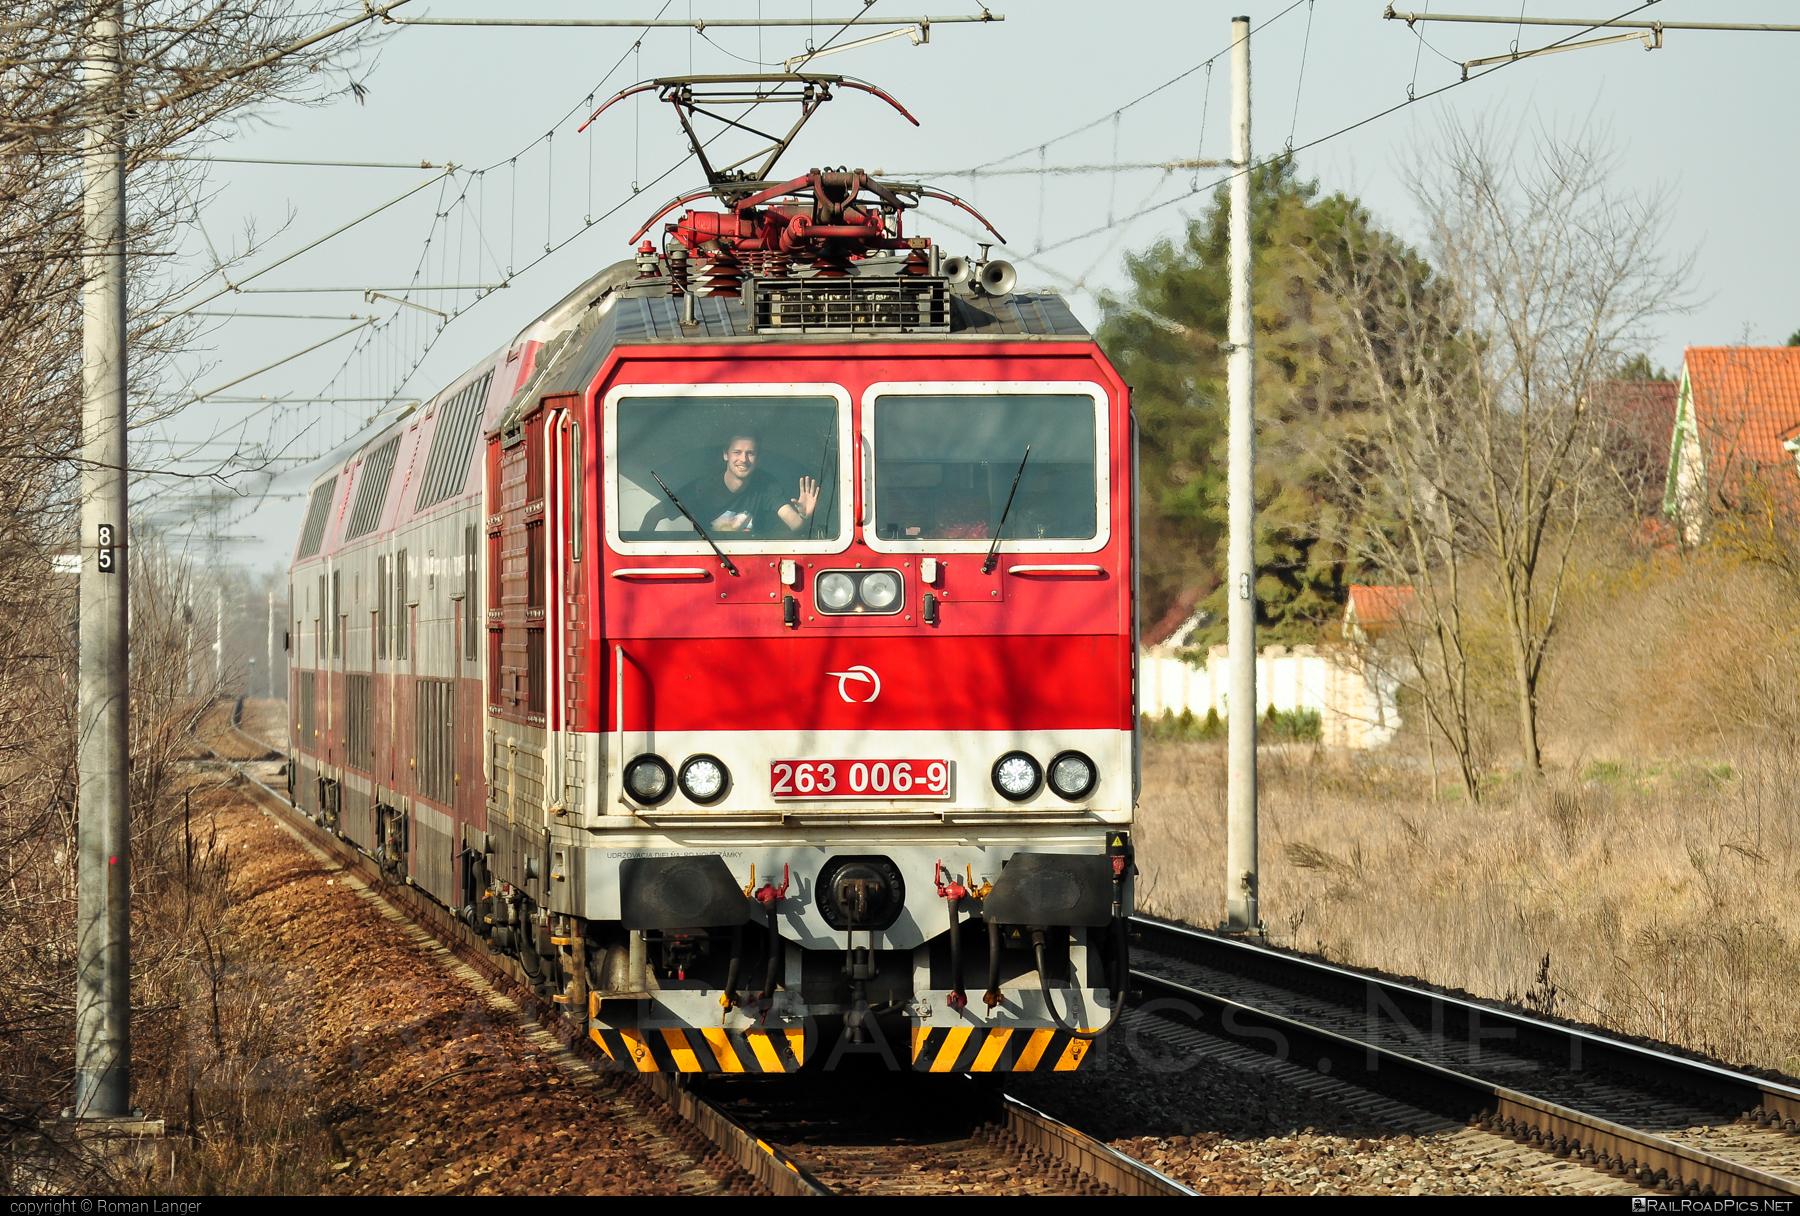 Škoda 70E - 263 006-9 operated by Železničná Spoločnost' Slovensko, a.s. #ZeleznicnaSpolocnostSlovensko #locomotive263 #princezna #skoda #skoda70e #zssk